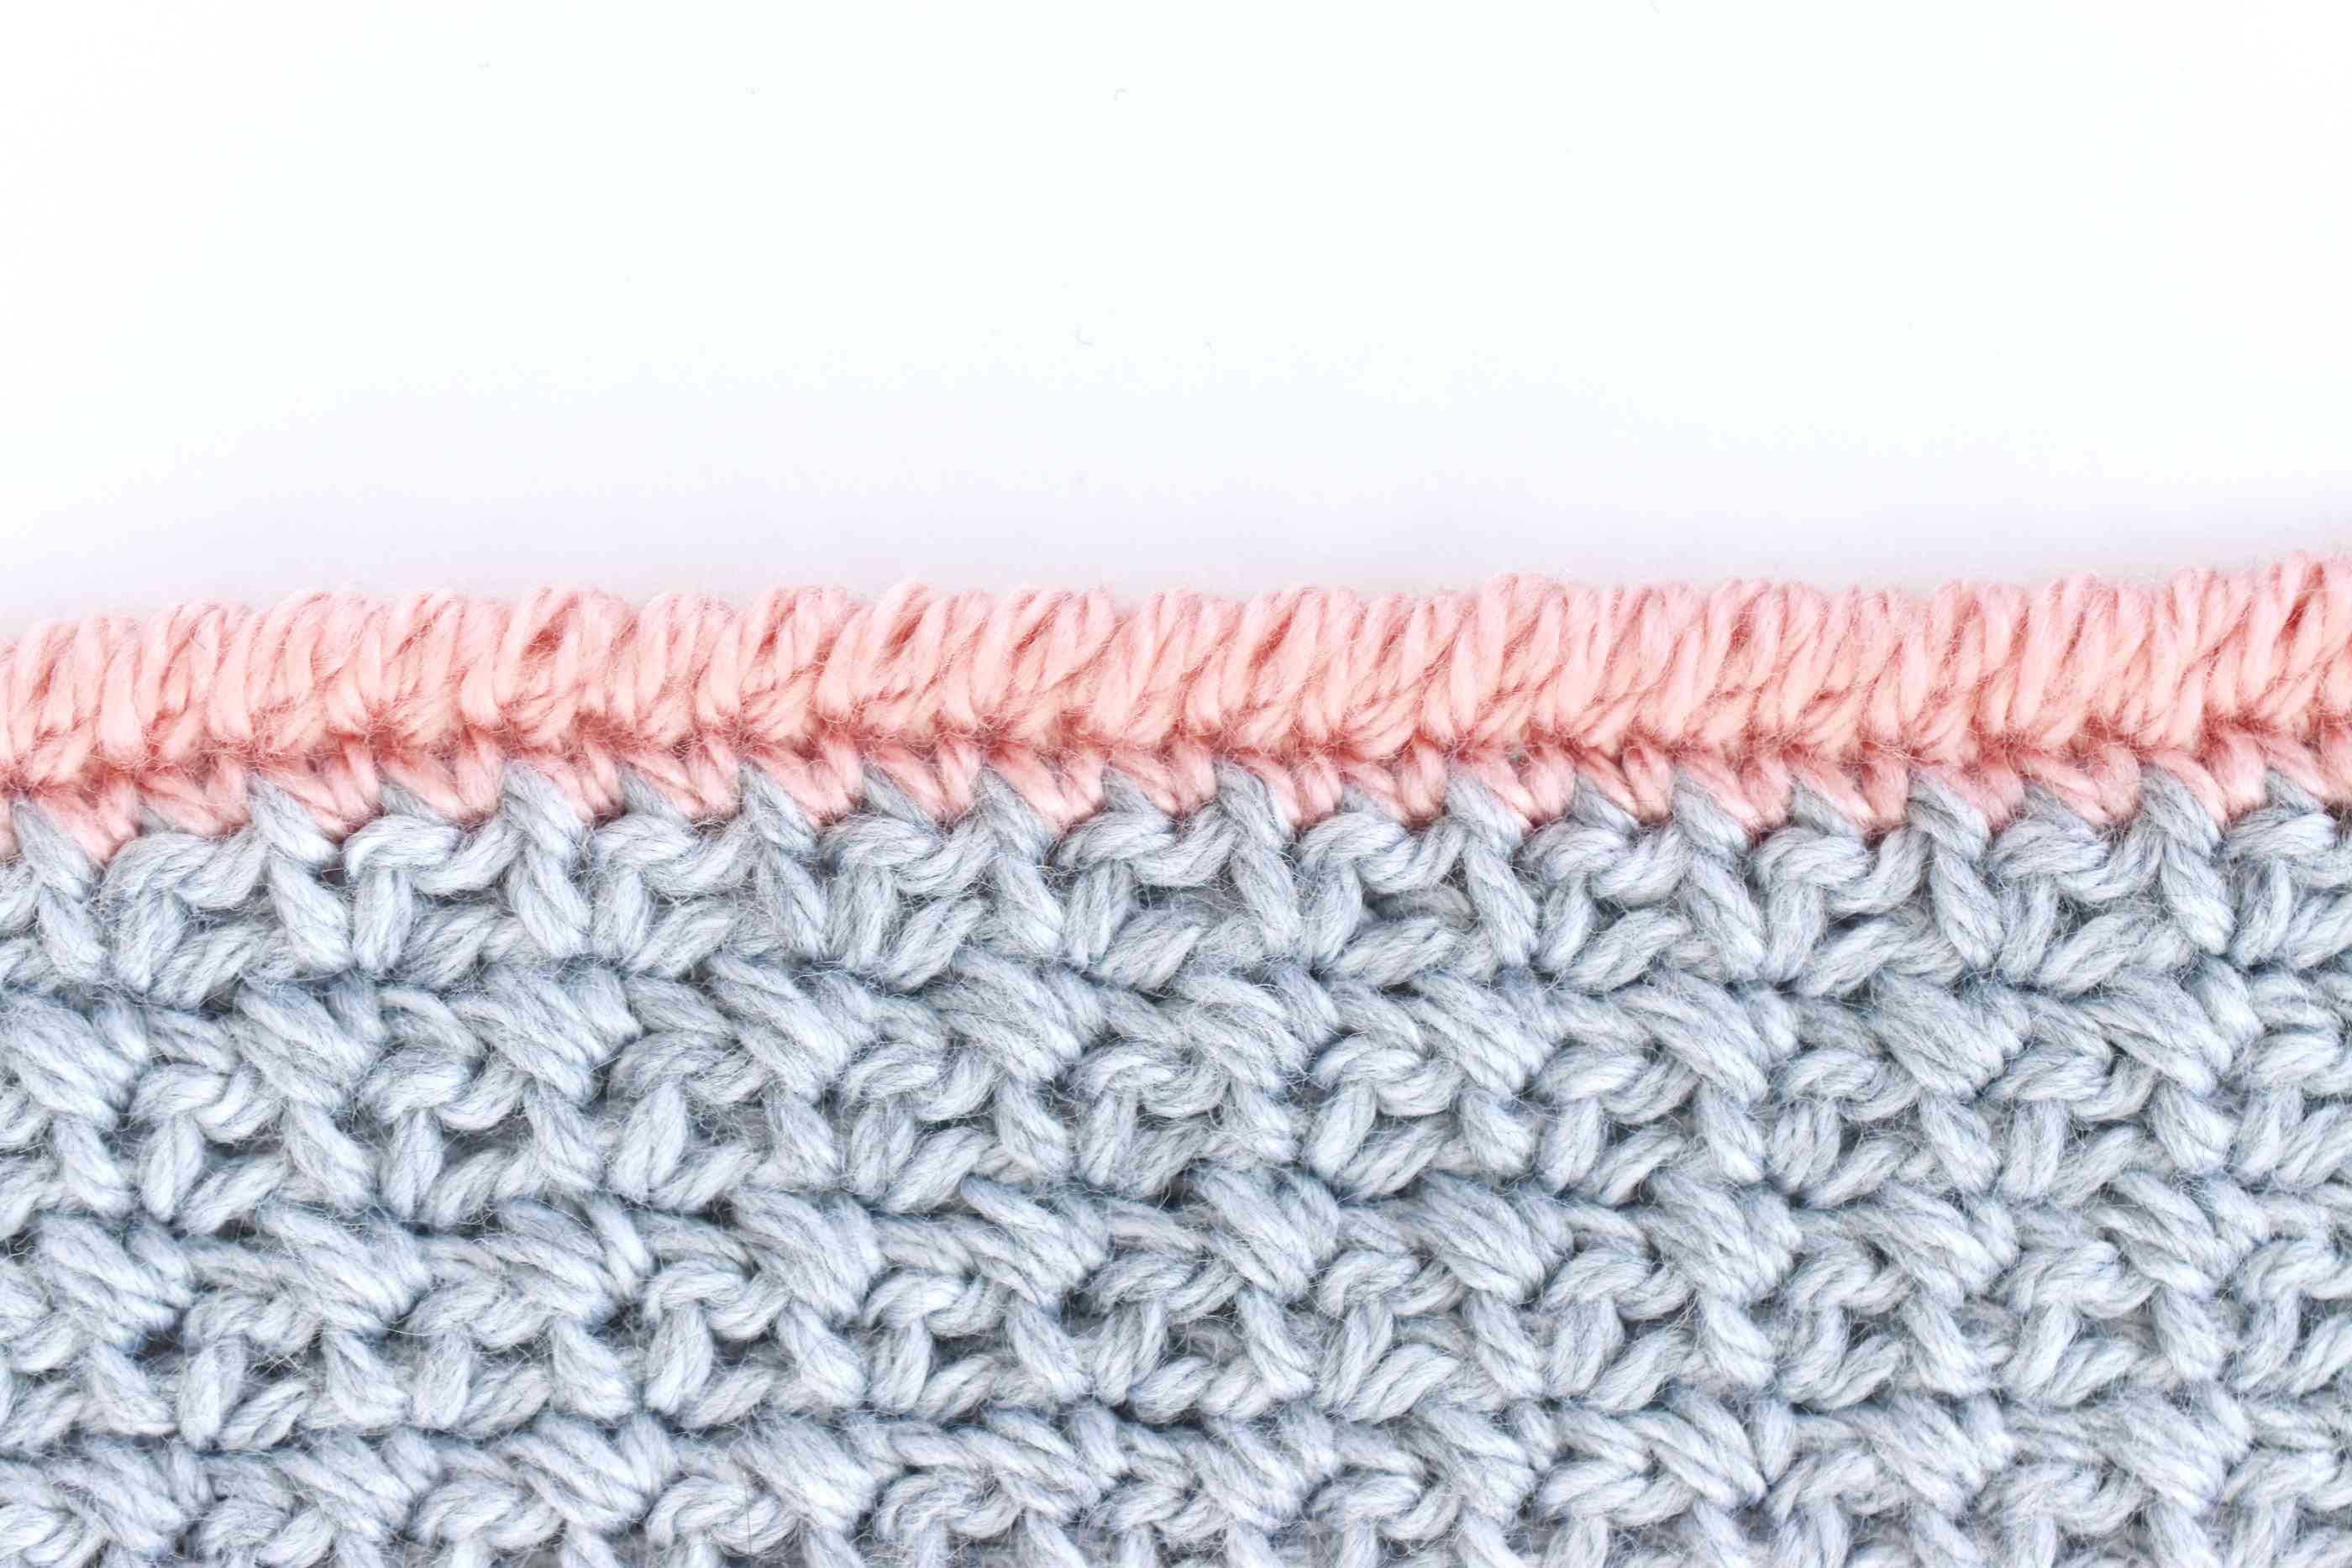 Crochet Crab Stitch Edging